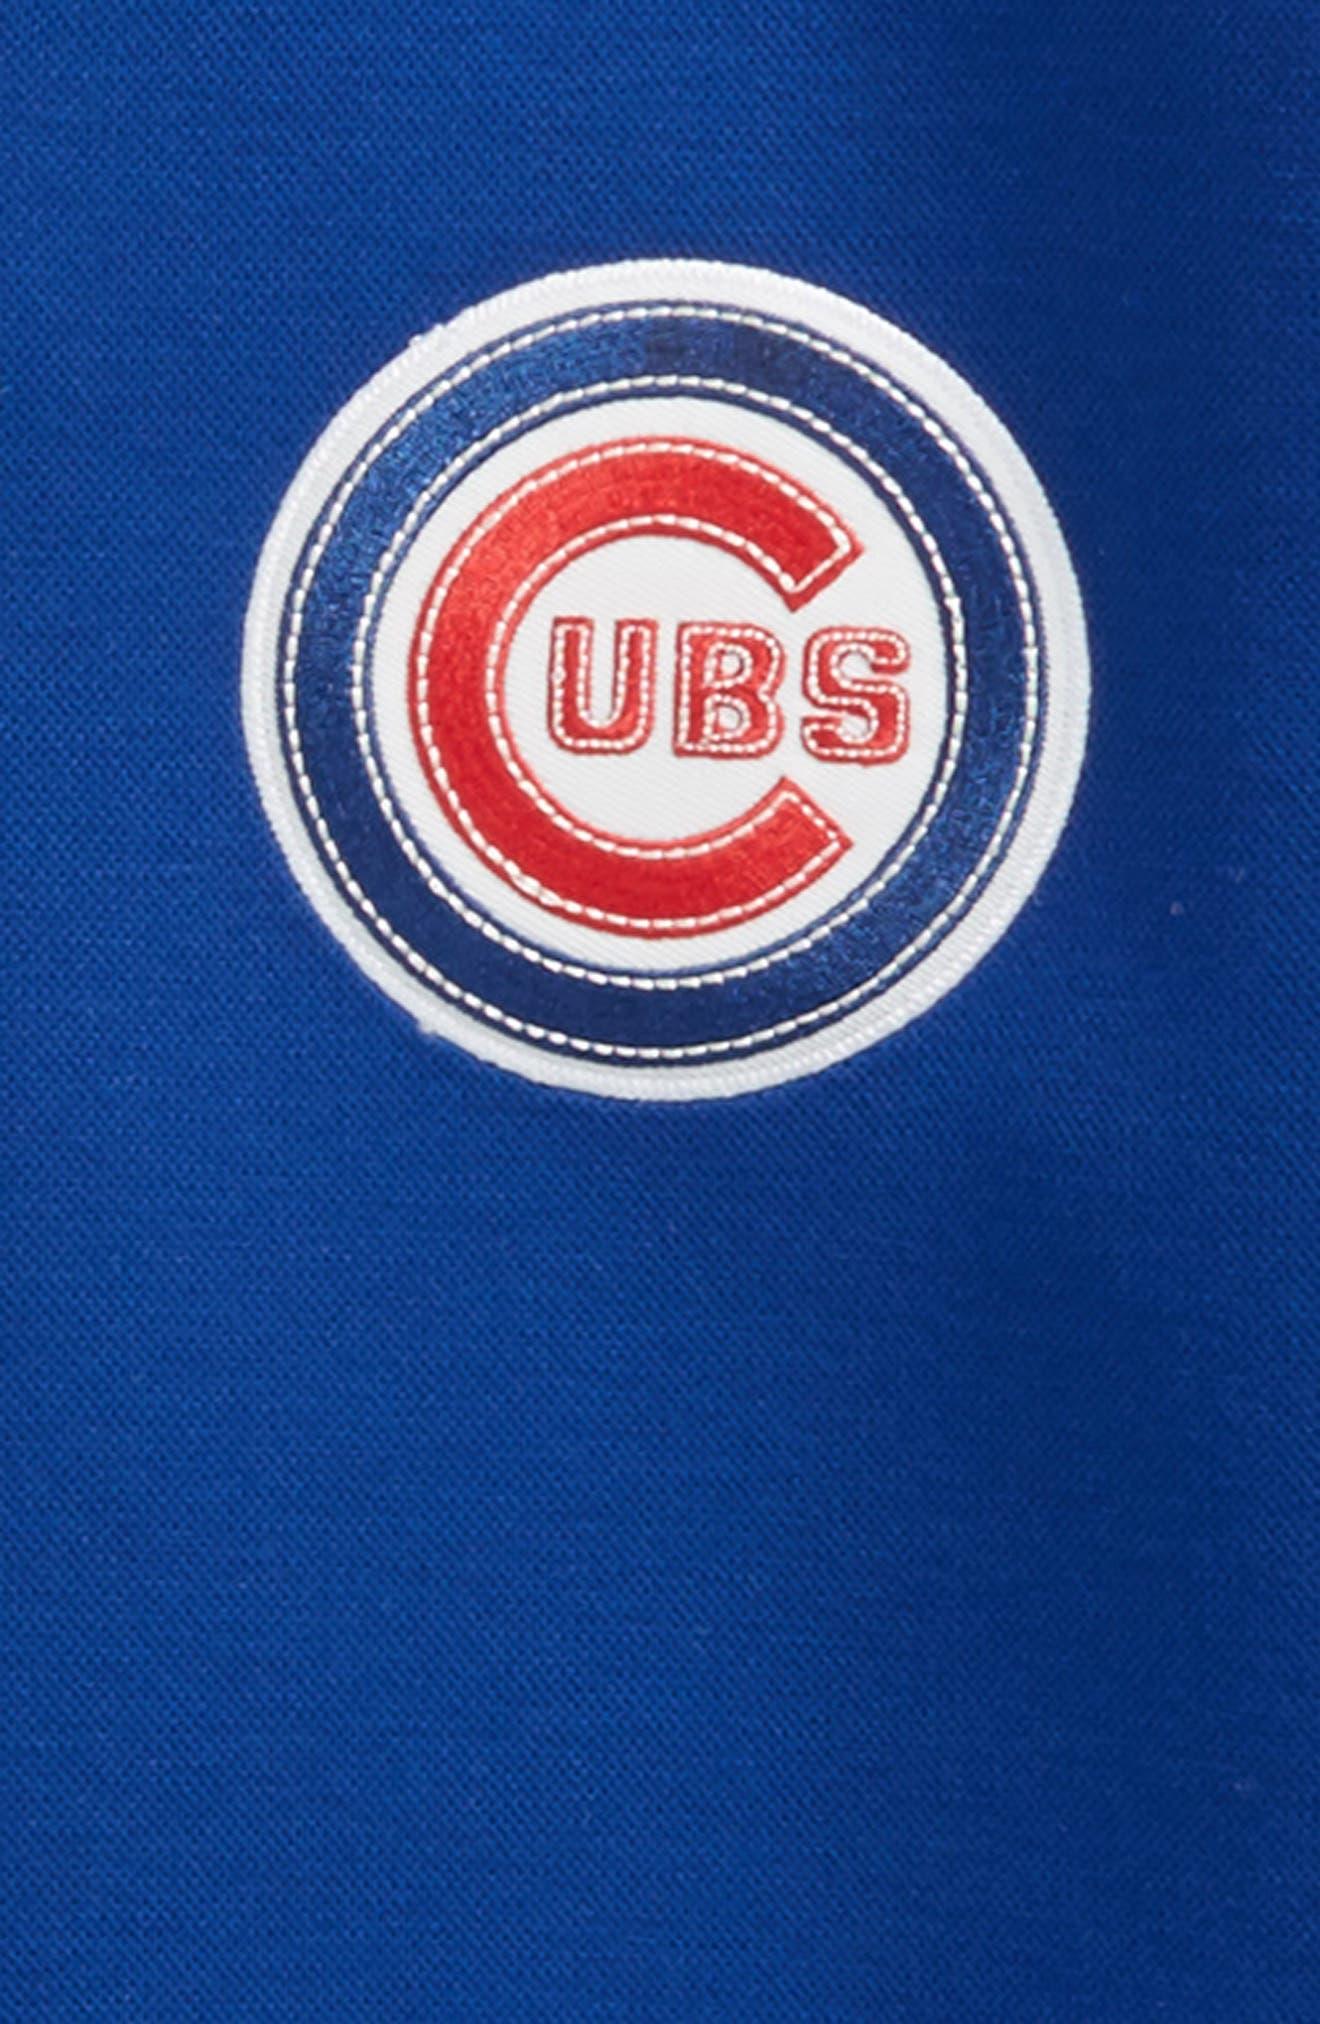 Classical Chicago Cubs Knit Varsity Jacket,                             Alternate thumbnail 2, color,                             Royal